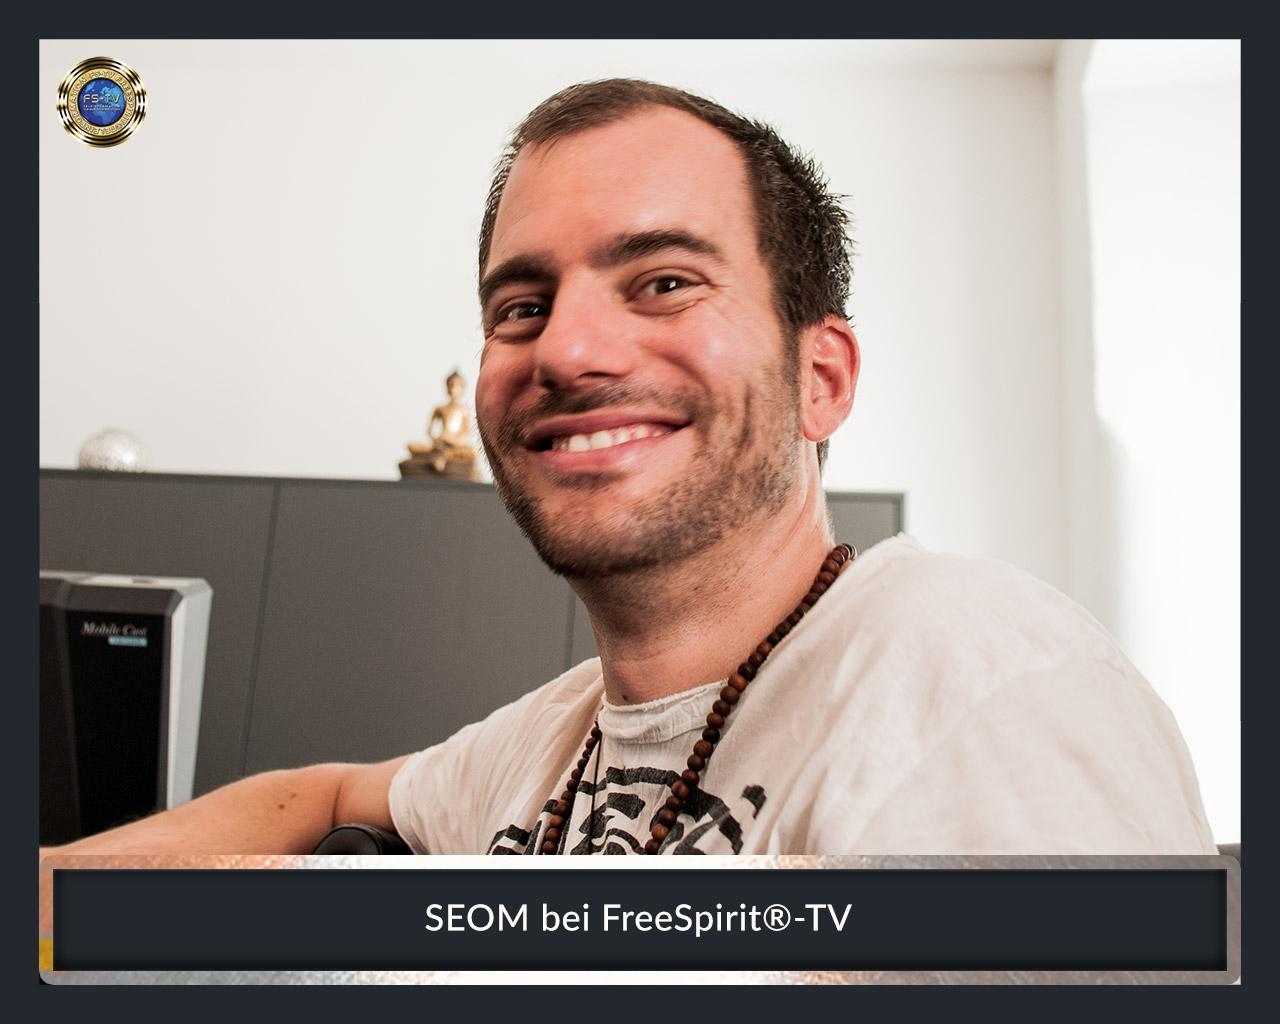 FS-TV-Bildergallerie-FS-SEOM-5